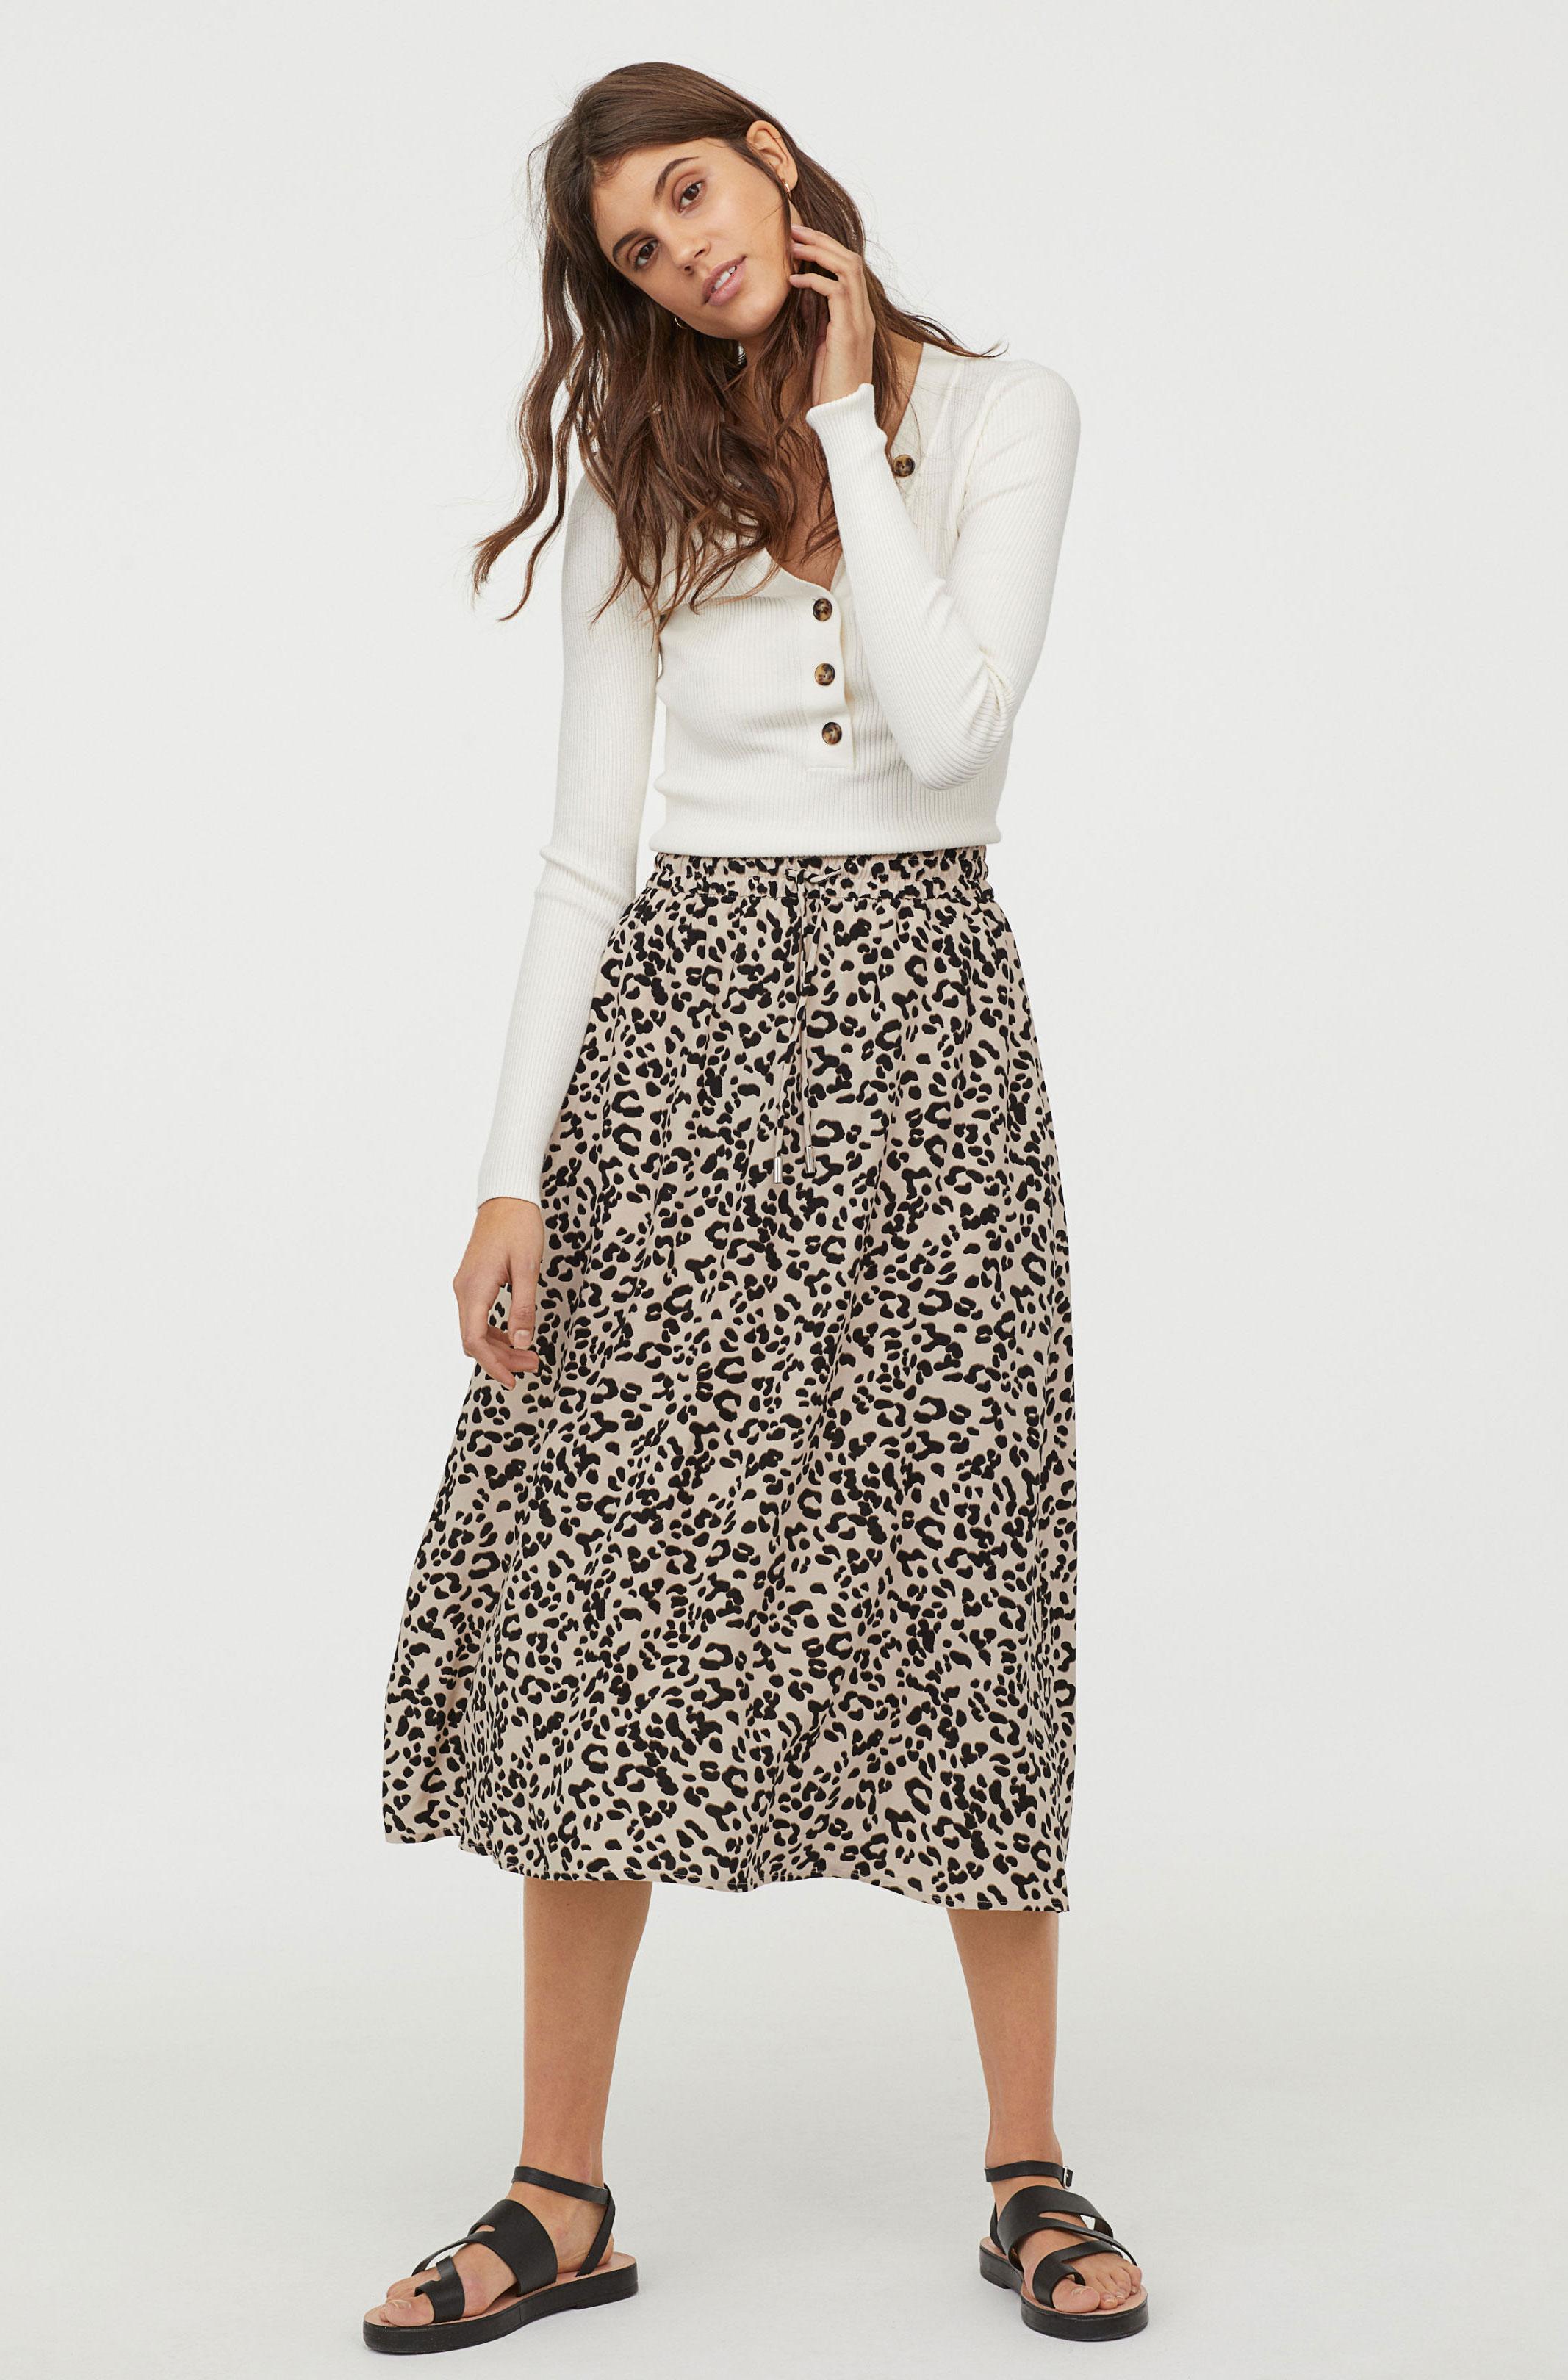 H&M Print Skirt     $29.99